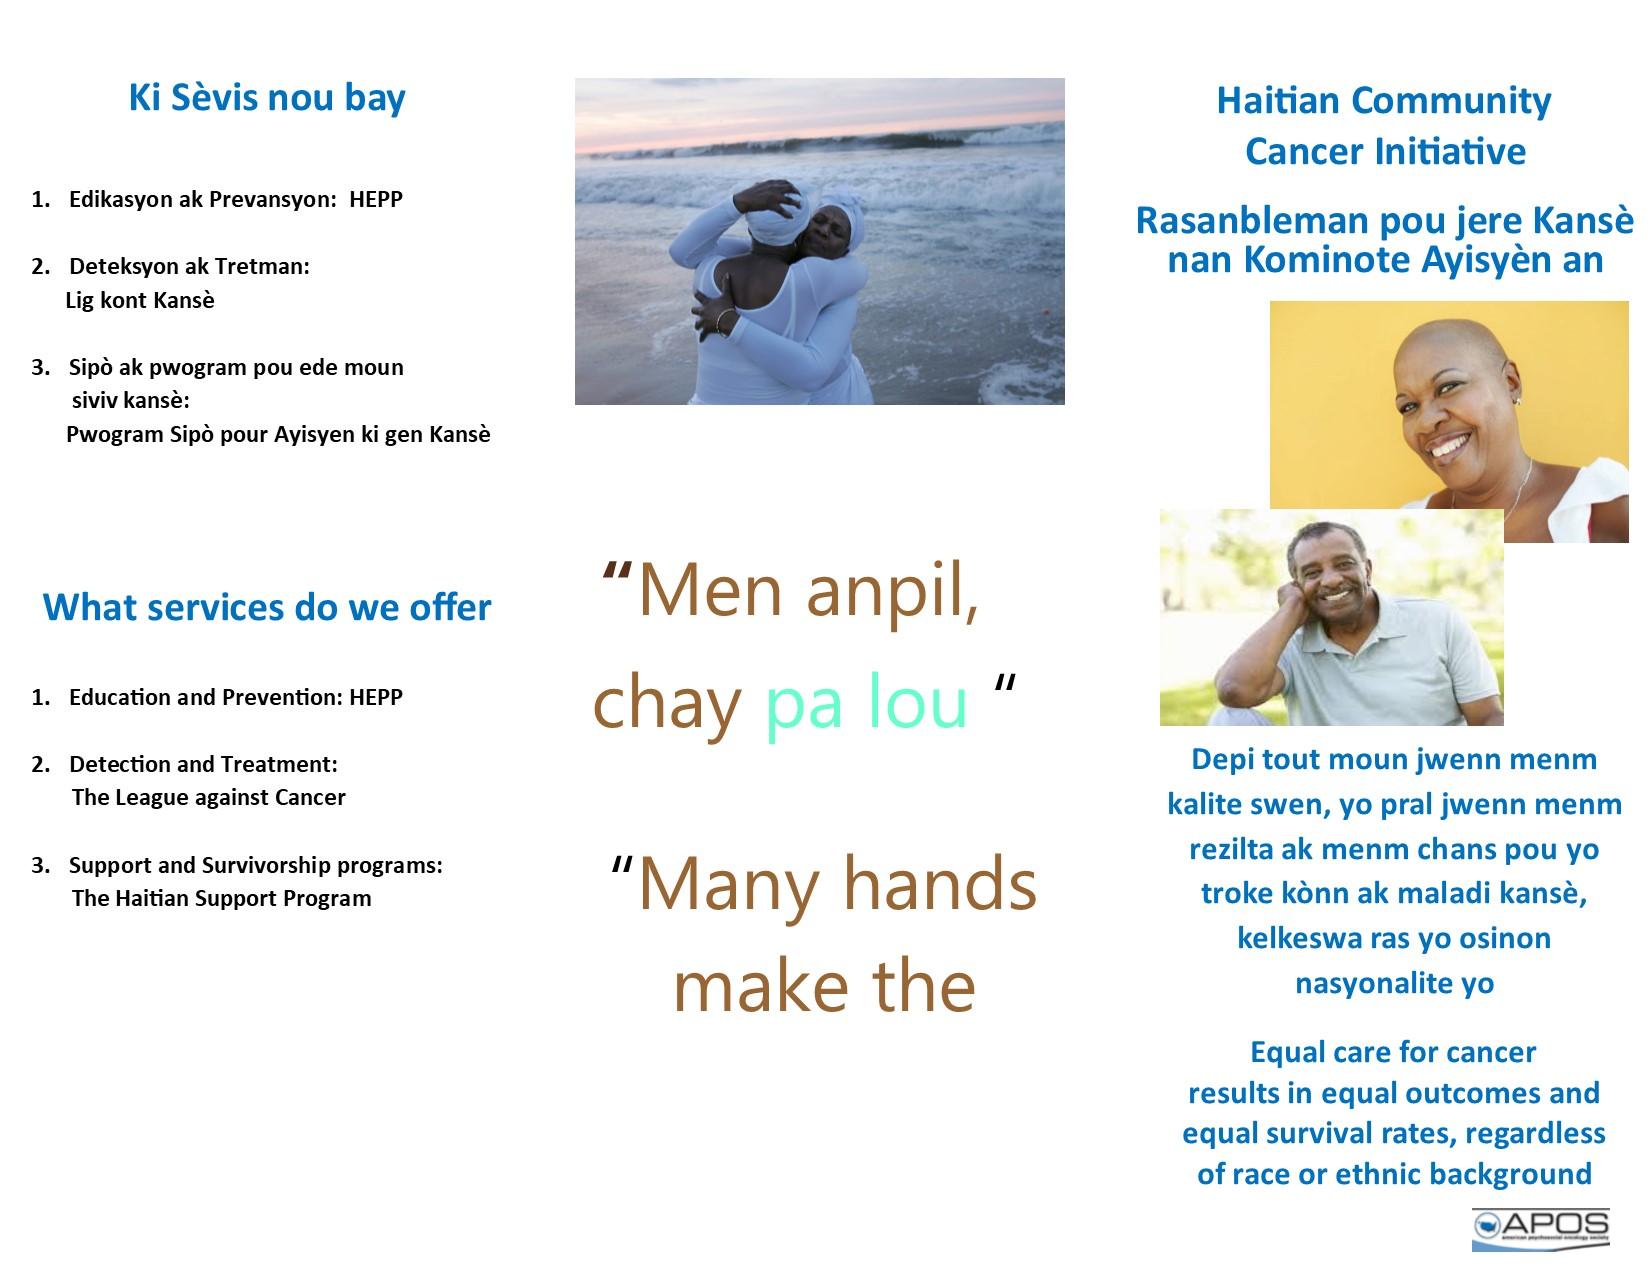 HCCI Haitian Community Cancer Initiative English Brochure 1